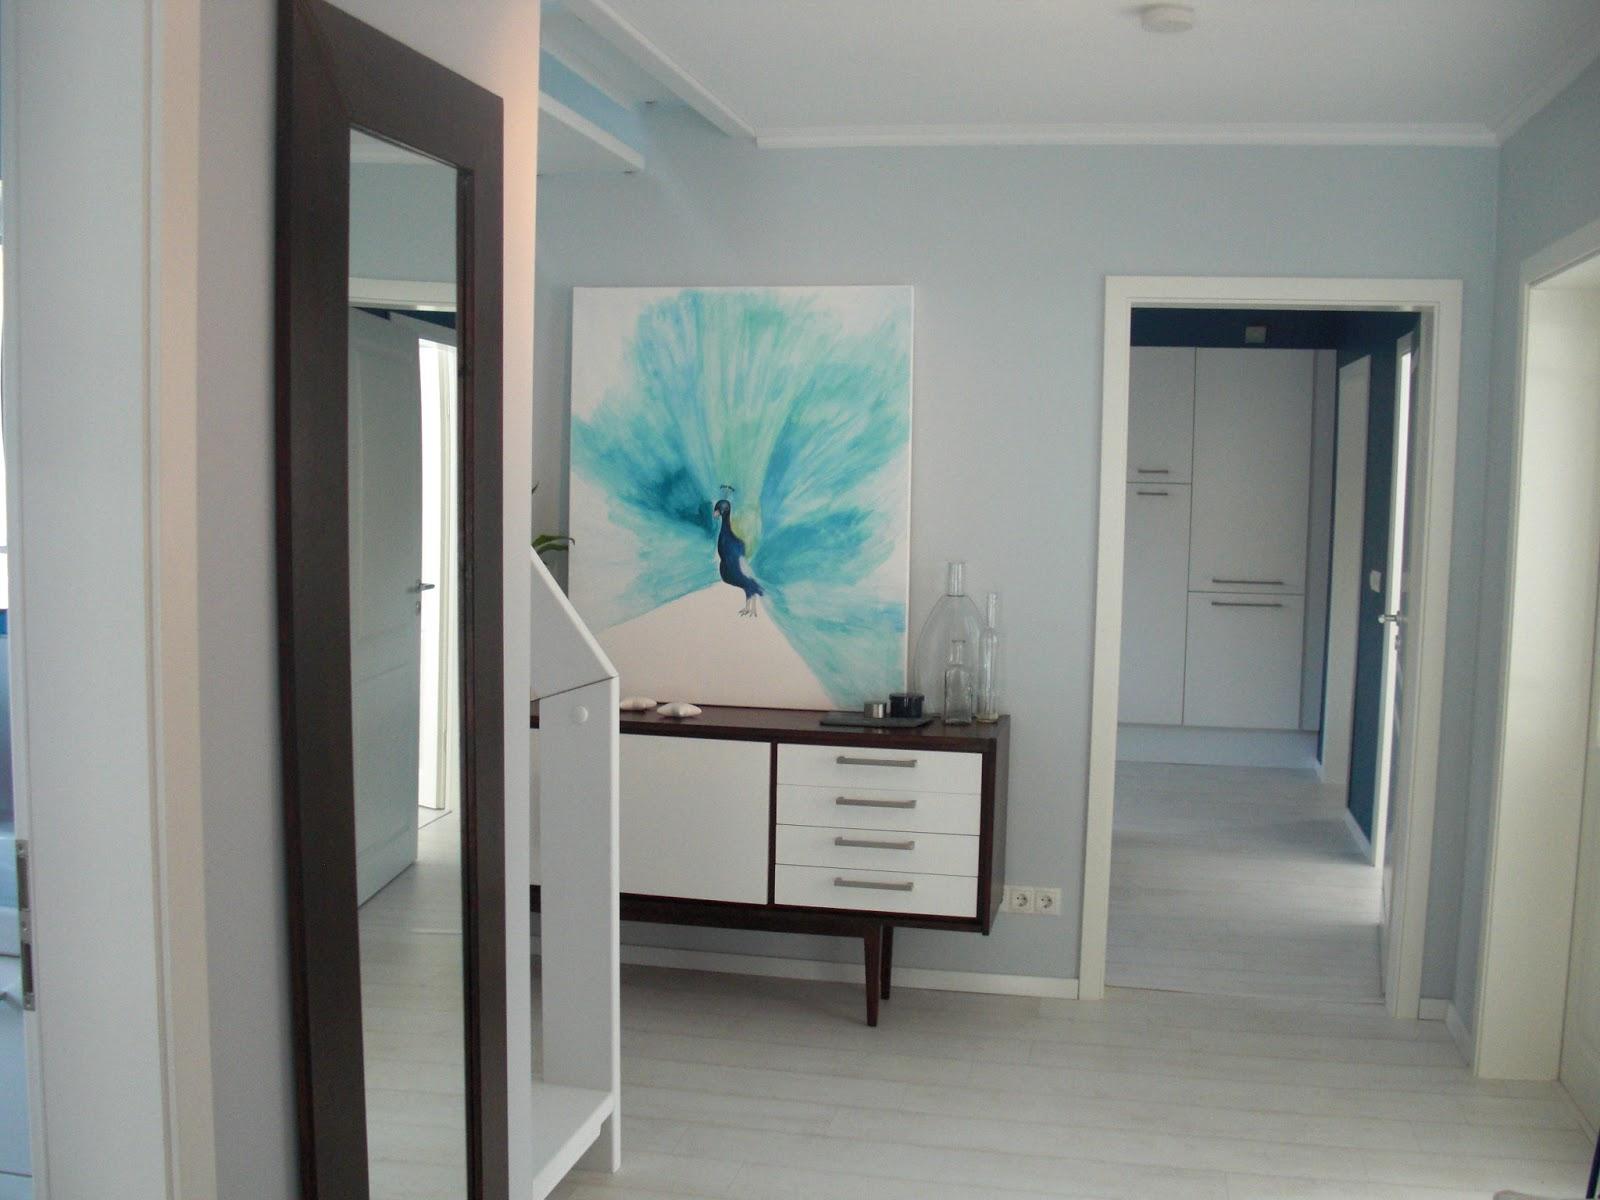 heim elich aquarellfarben bild pfau. Black Bedroom Furniture Sets. Home Design Ideas